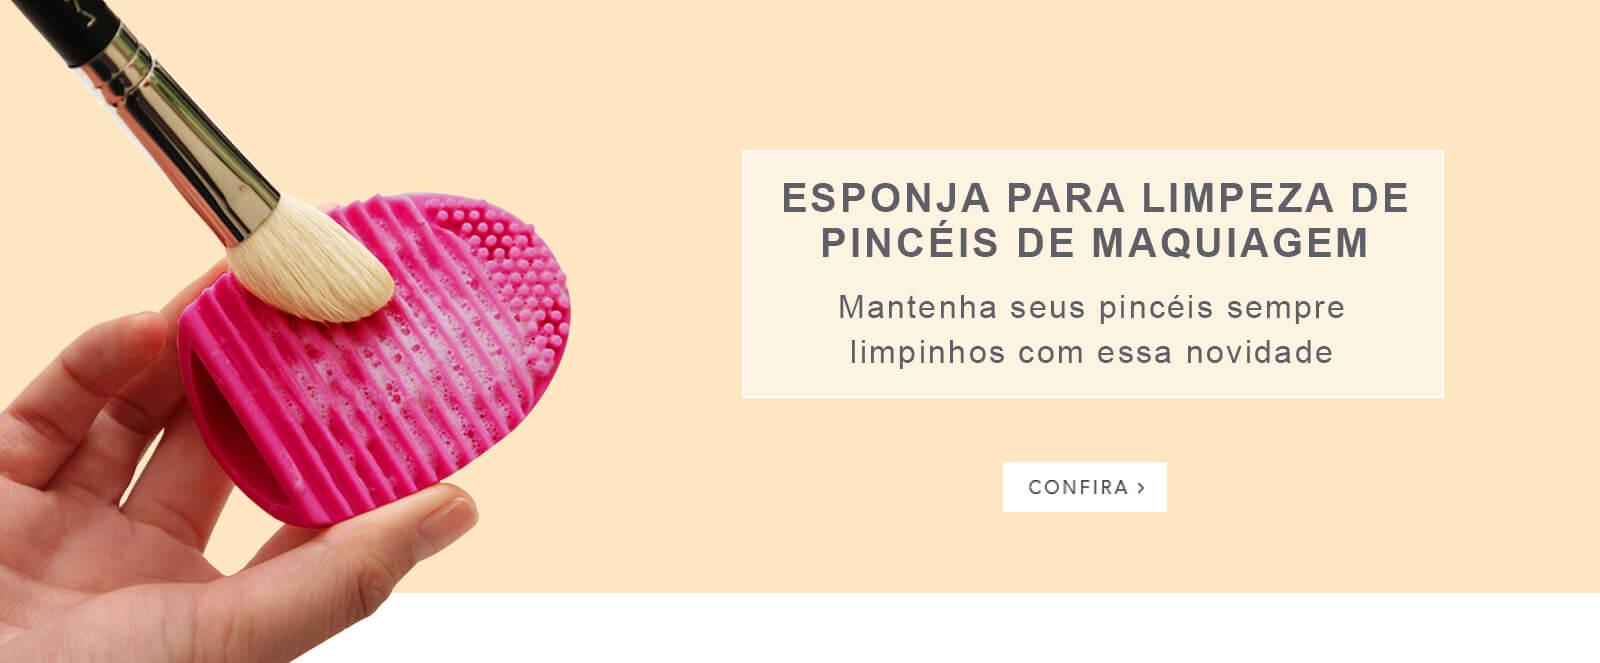 Banner Esponja Limpeza pincel maquiagem